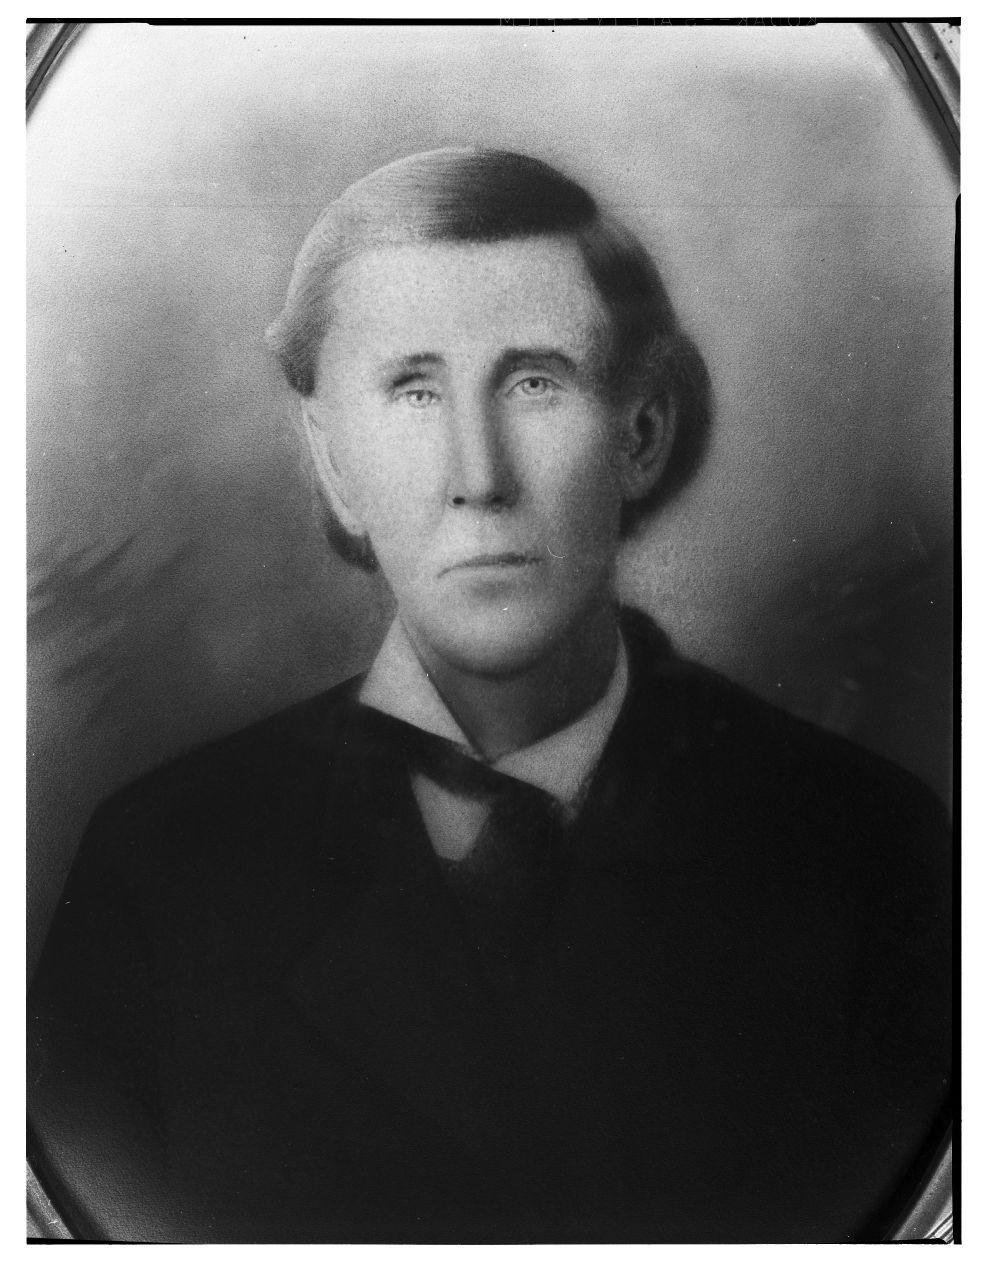 Moses Grinter